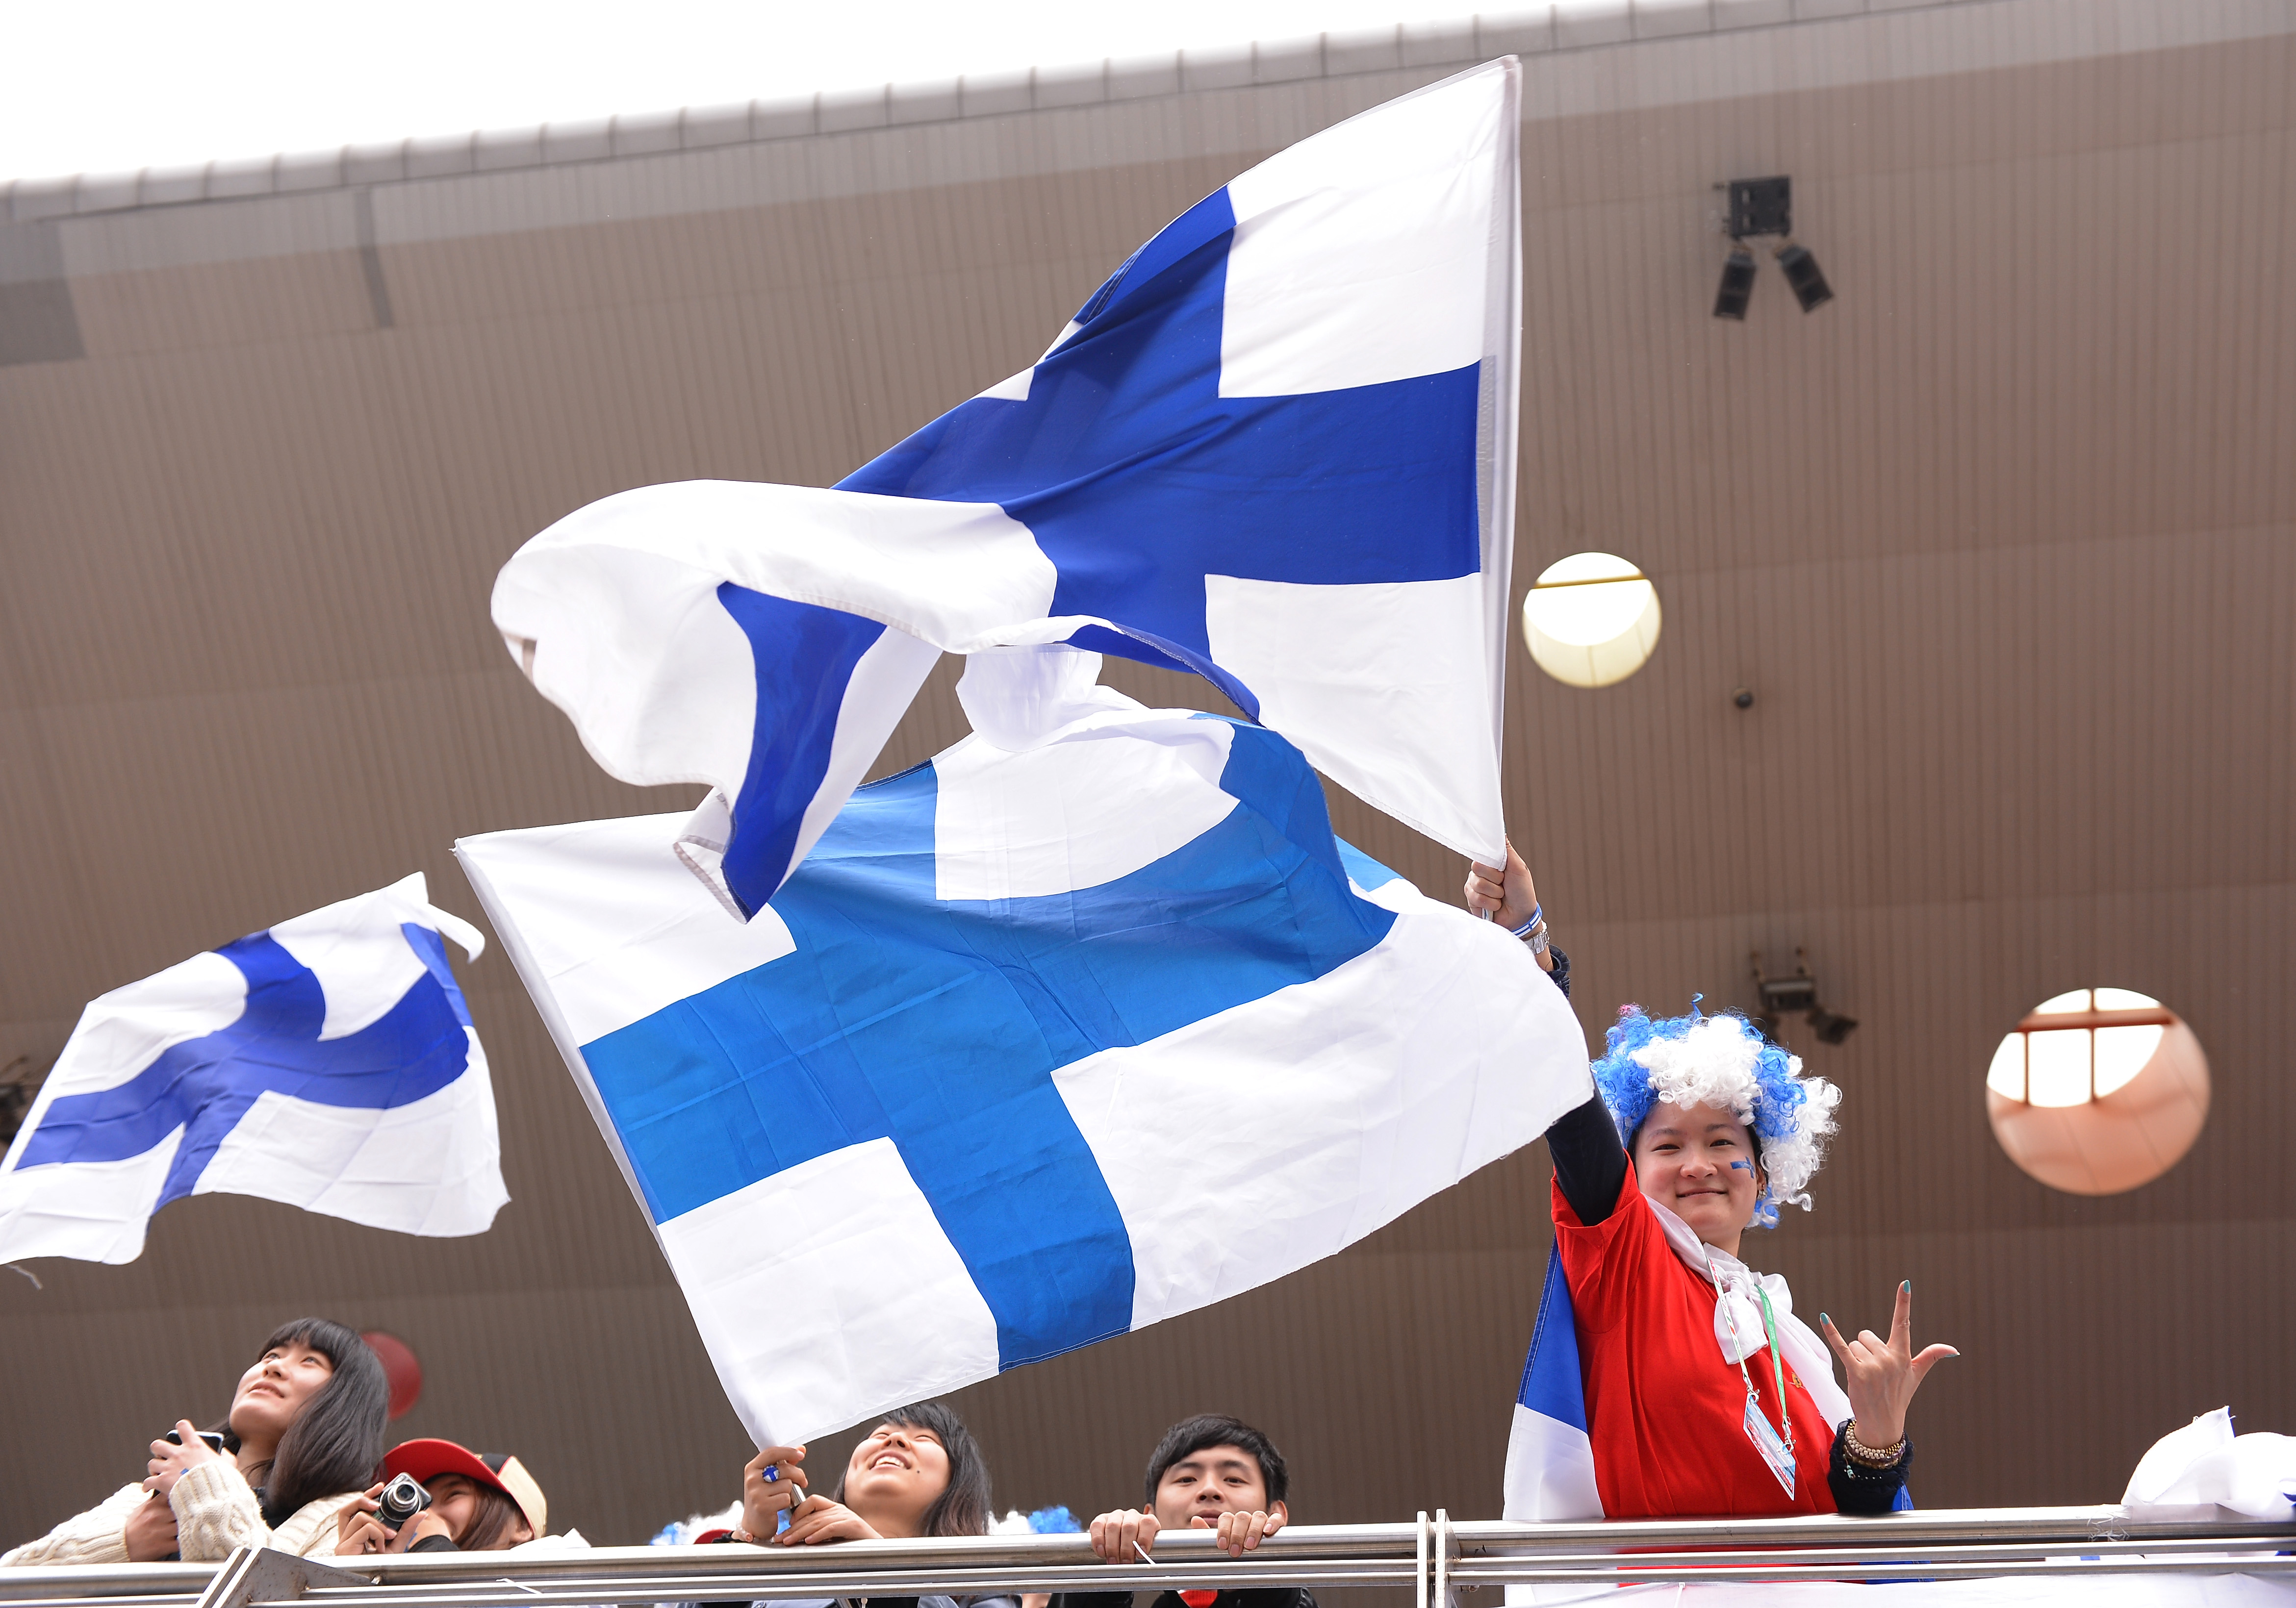 U18 WORLDS: World U18s - How Finland Won Gold